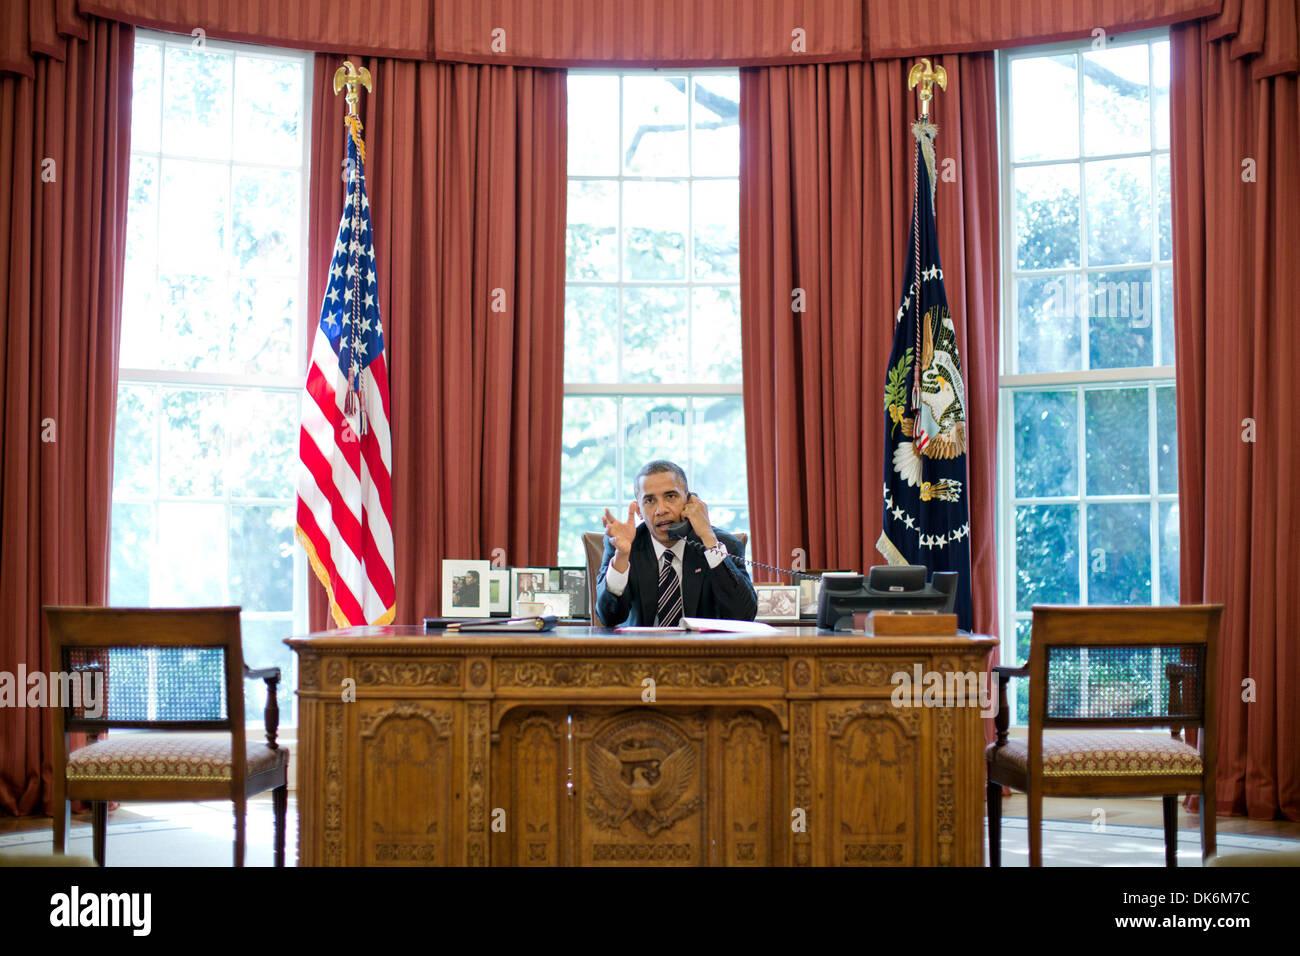 U.S President Barack Obama talks on phone with Israeli Prime Minister Benjamin Netanyahu in Oval Office Washington D.C.  - Stock Photo